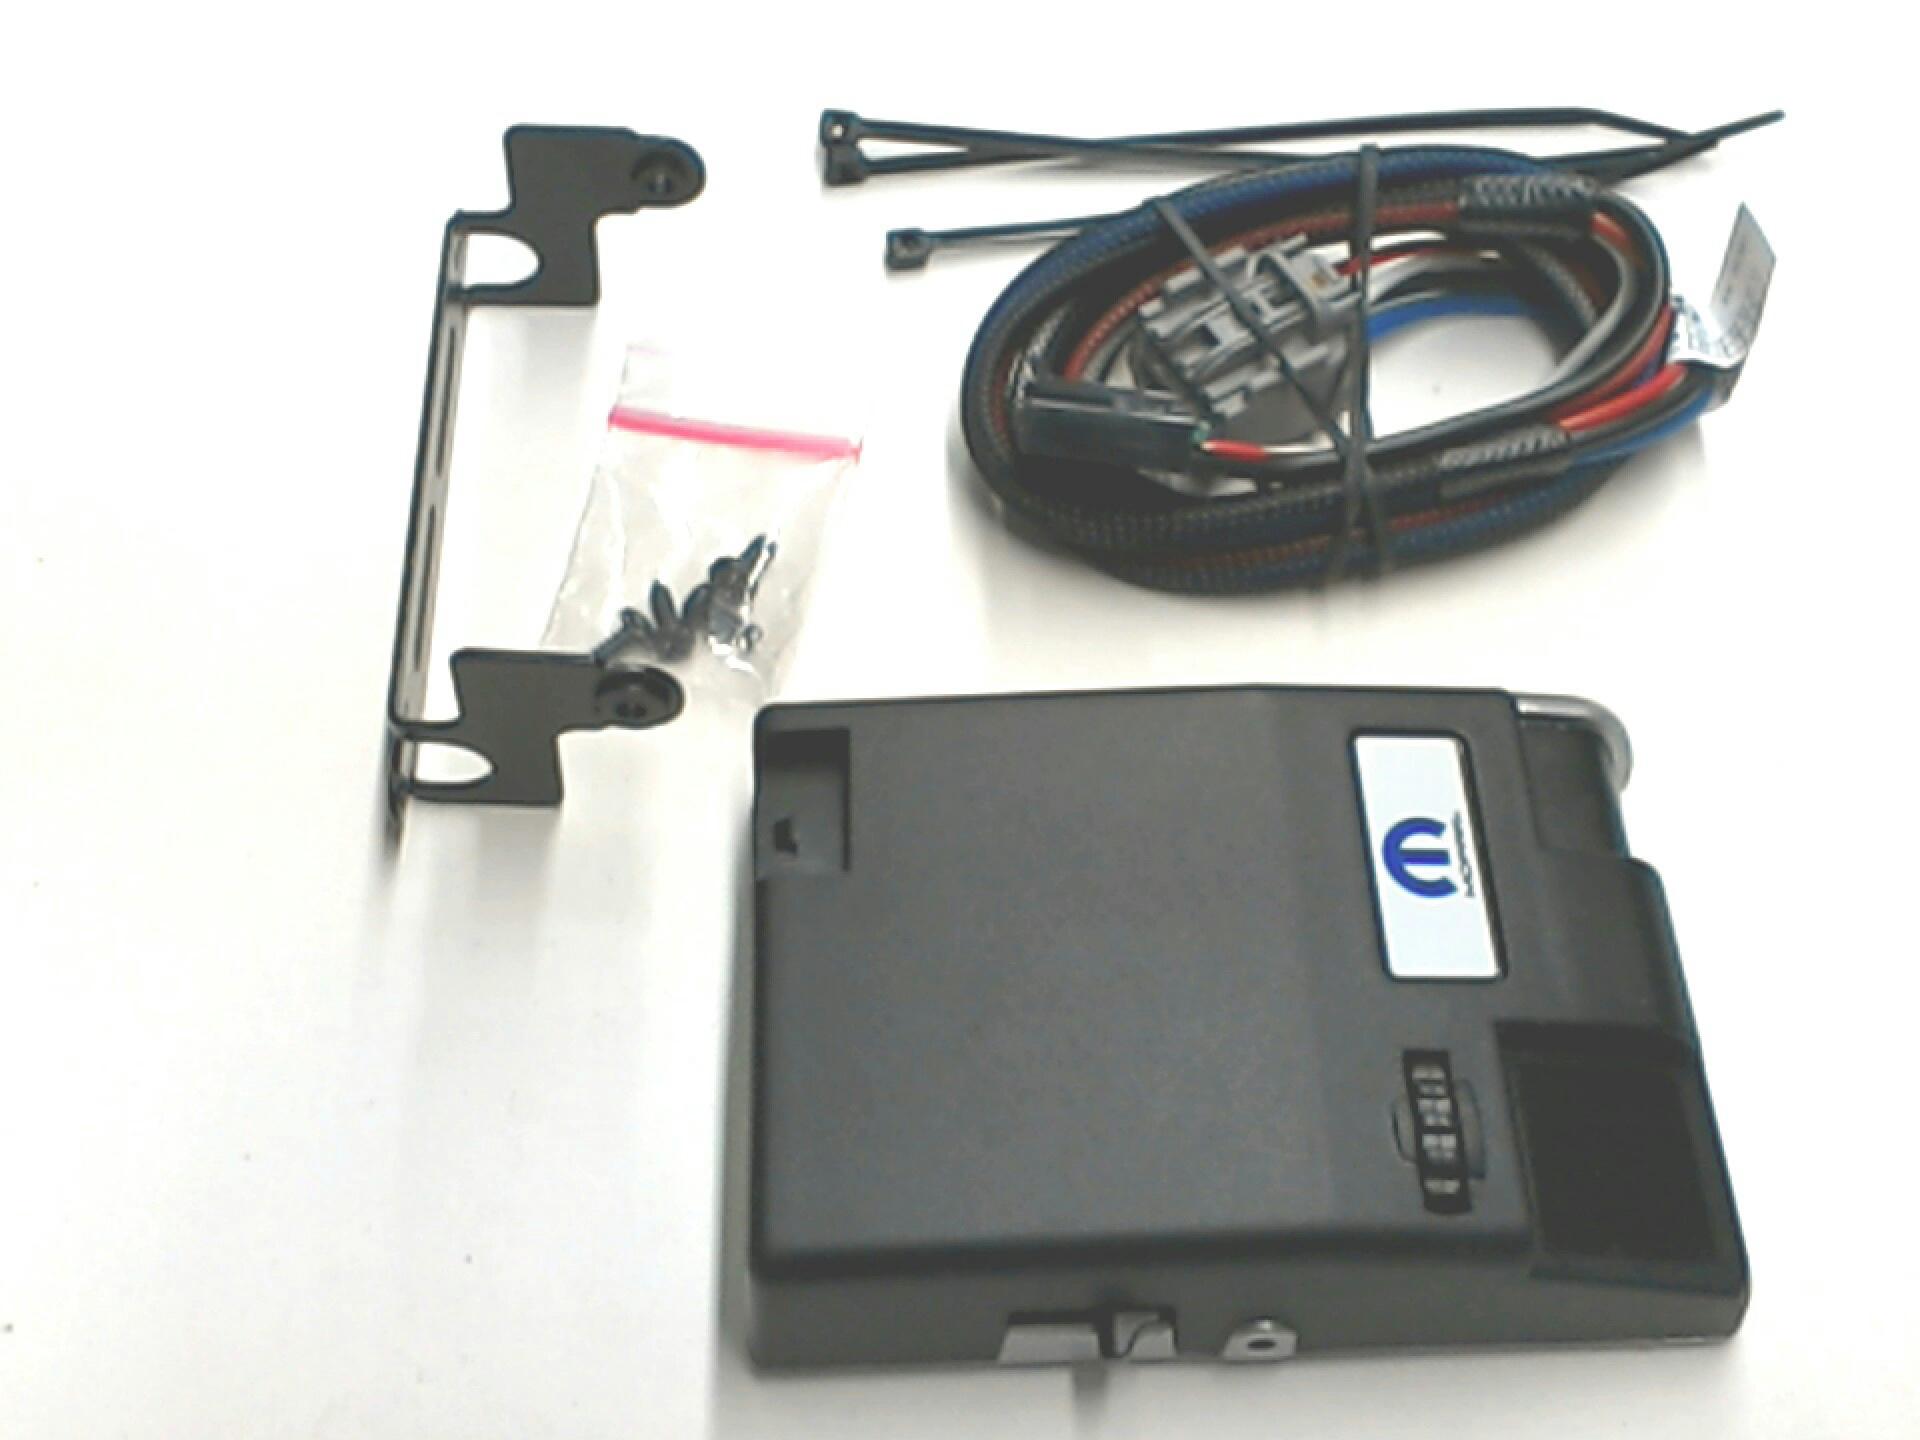 2004 Dodge Sprinter 2500 Digital Electronic Brake Control